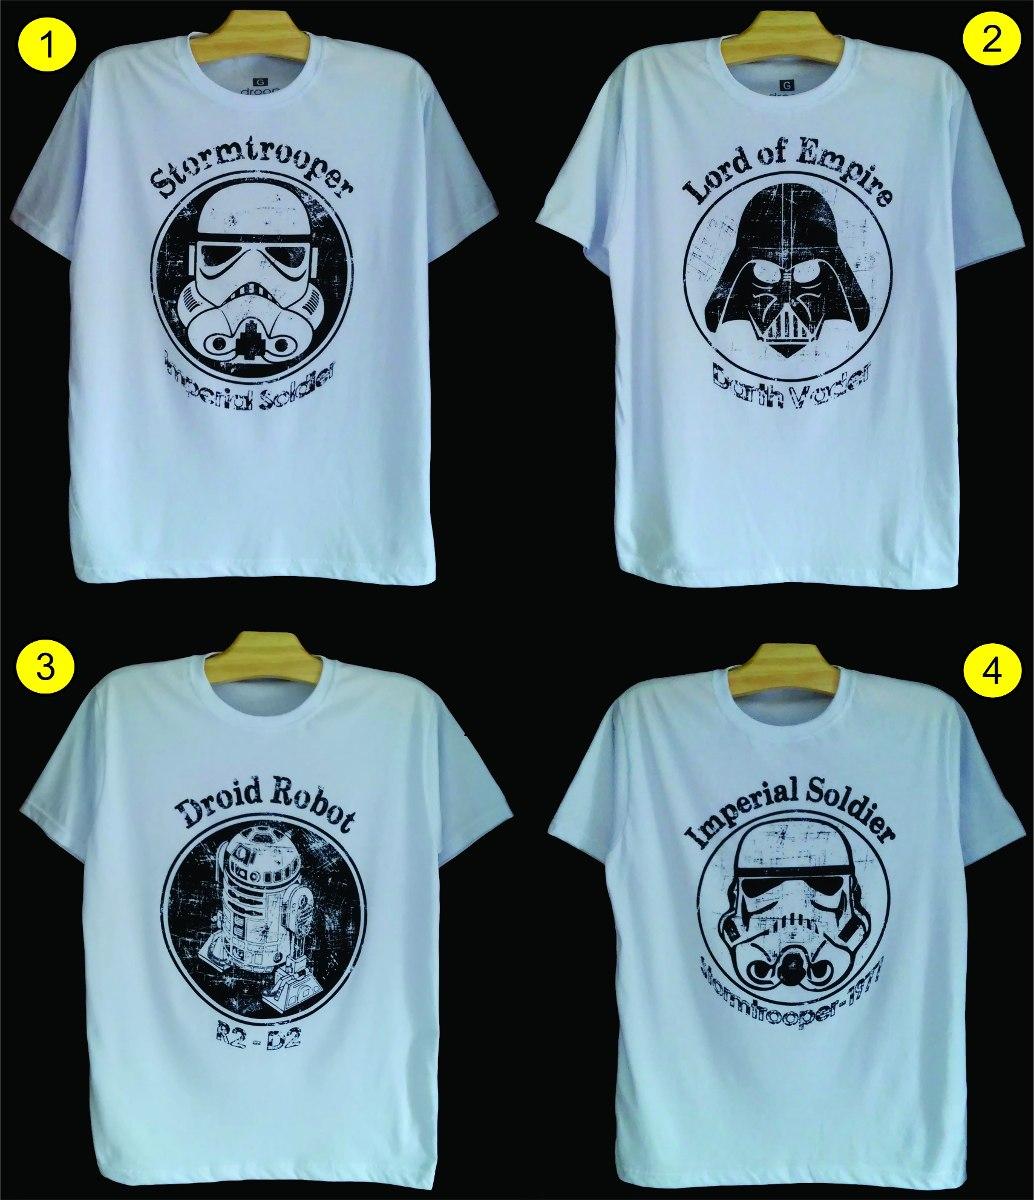 ab8887b06 camiseta star wars exclusiva - stormtrooper darth vader r2d2. Carregando  zoom.